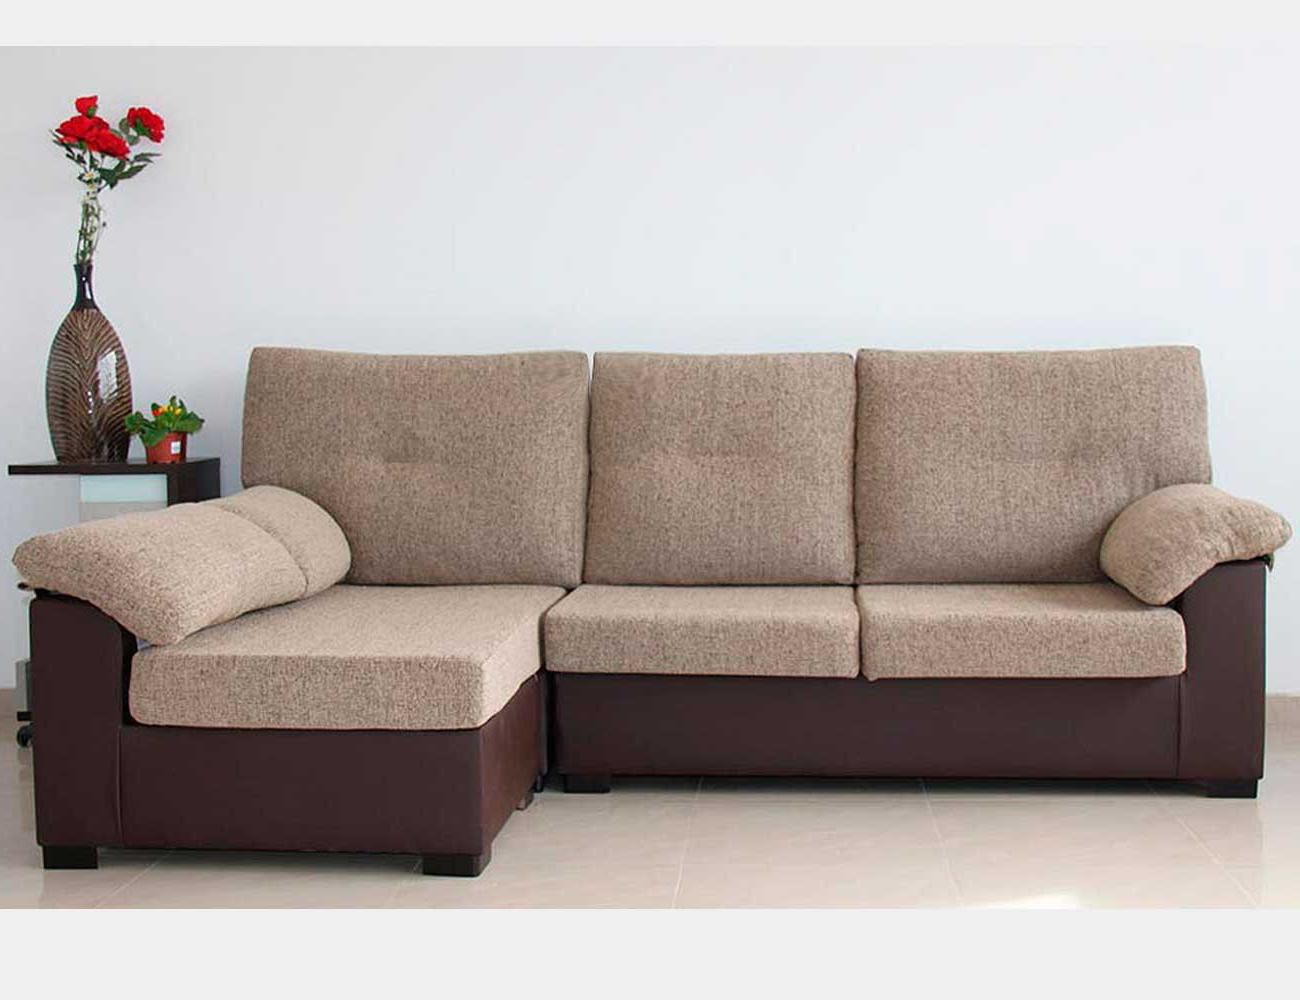 Sofa Esquinero Pequeño Ipdd Excelente sofas Cheslong Baratos Nuevo Del sofa Chaise Longue Peque